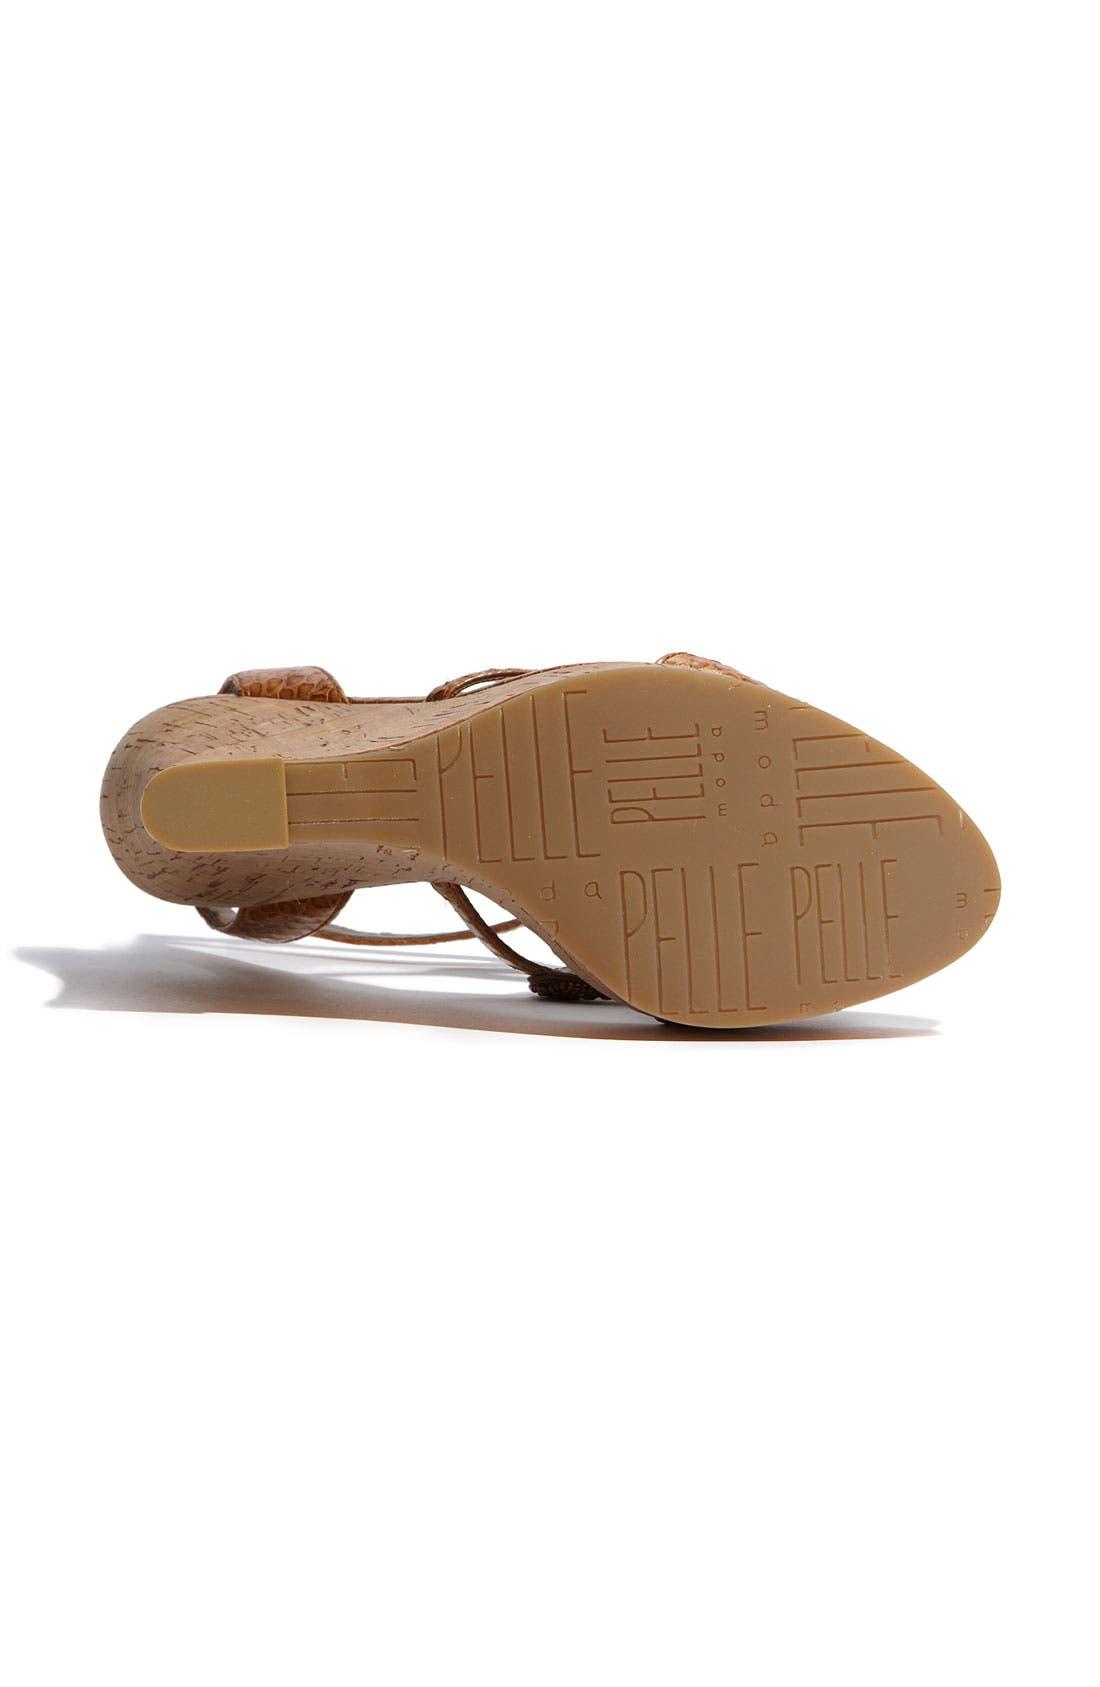 Alternate Image 4  - Pelle Moda 'Niland' Wedge Sandal